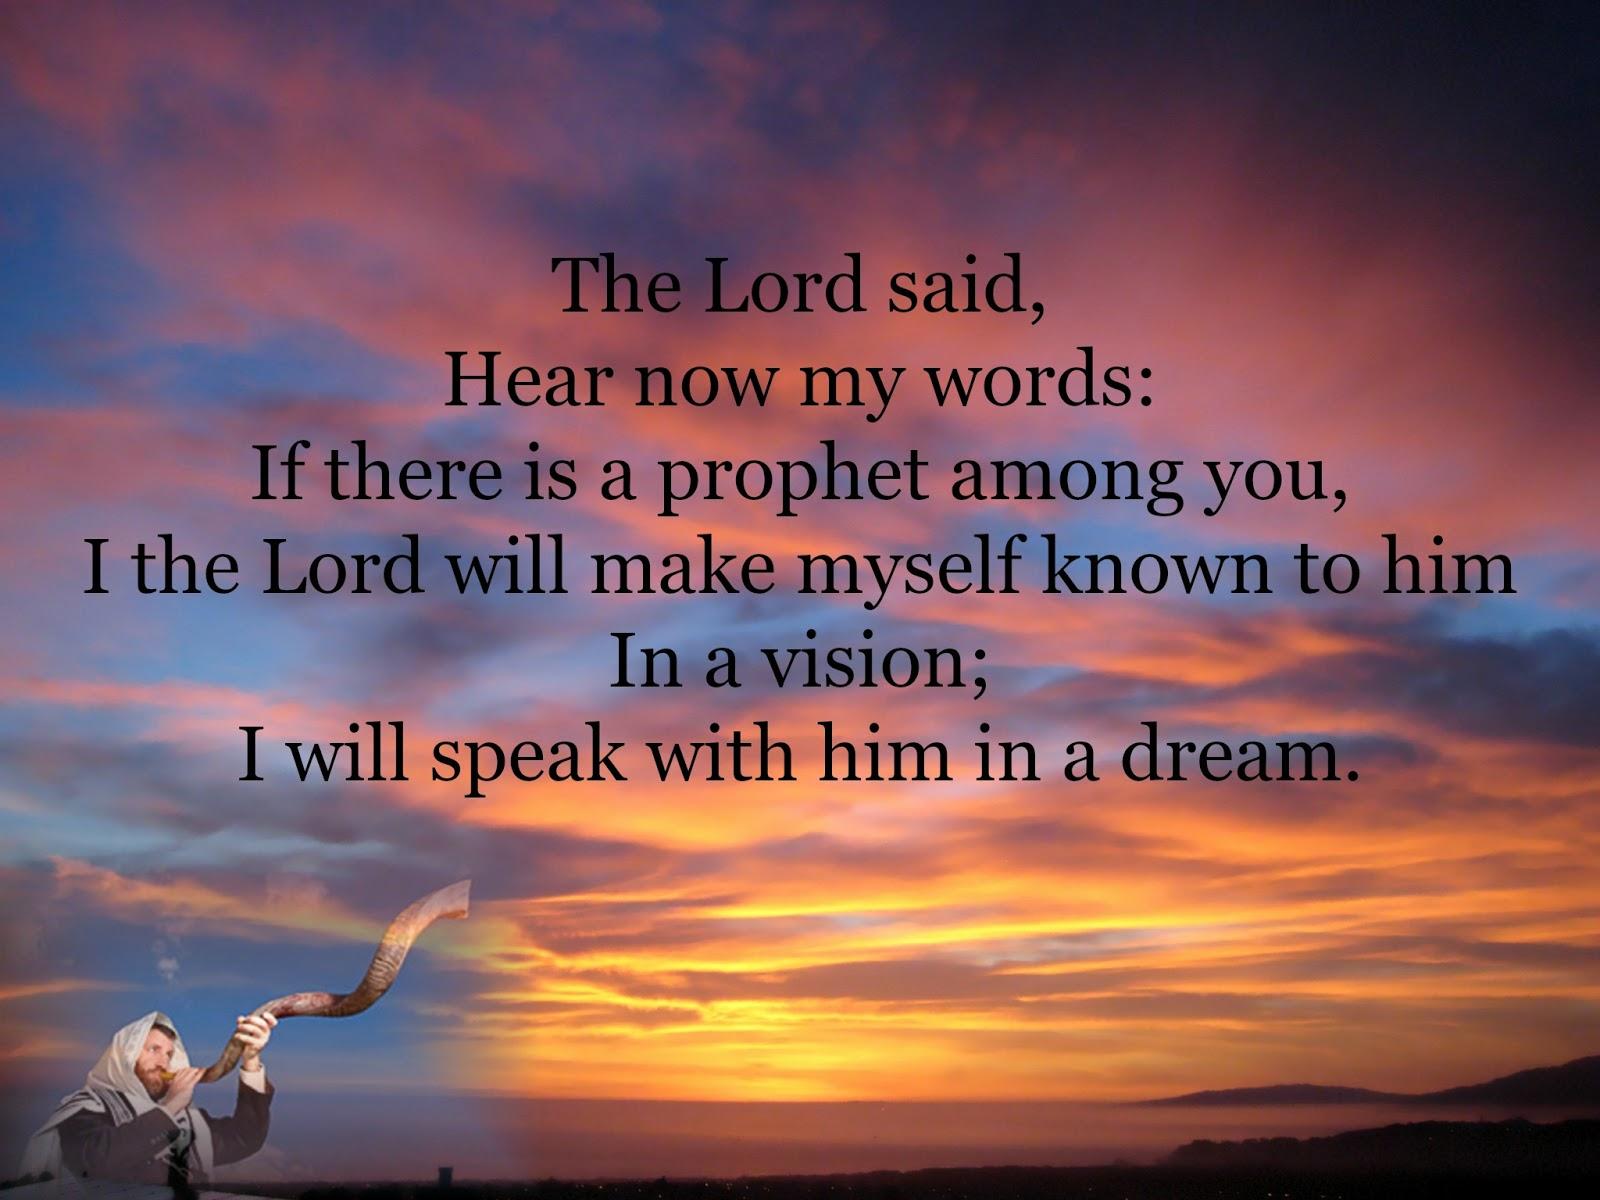 What dreams - prophetic 1